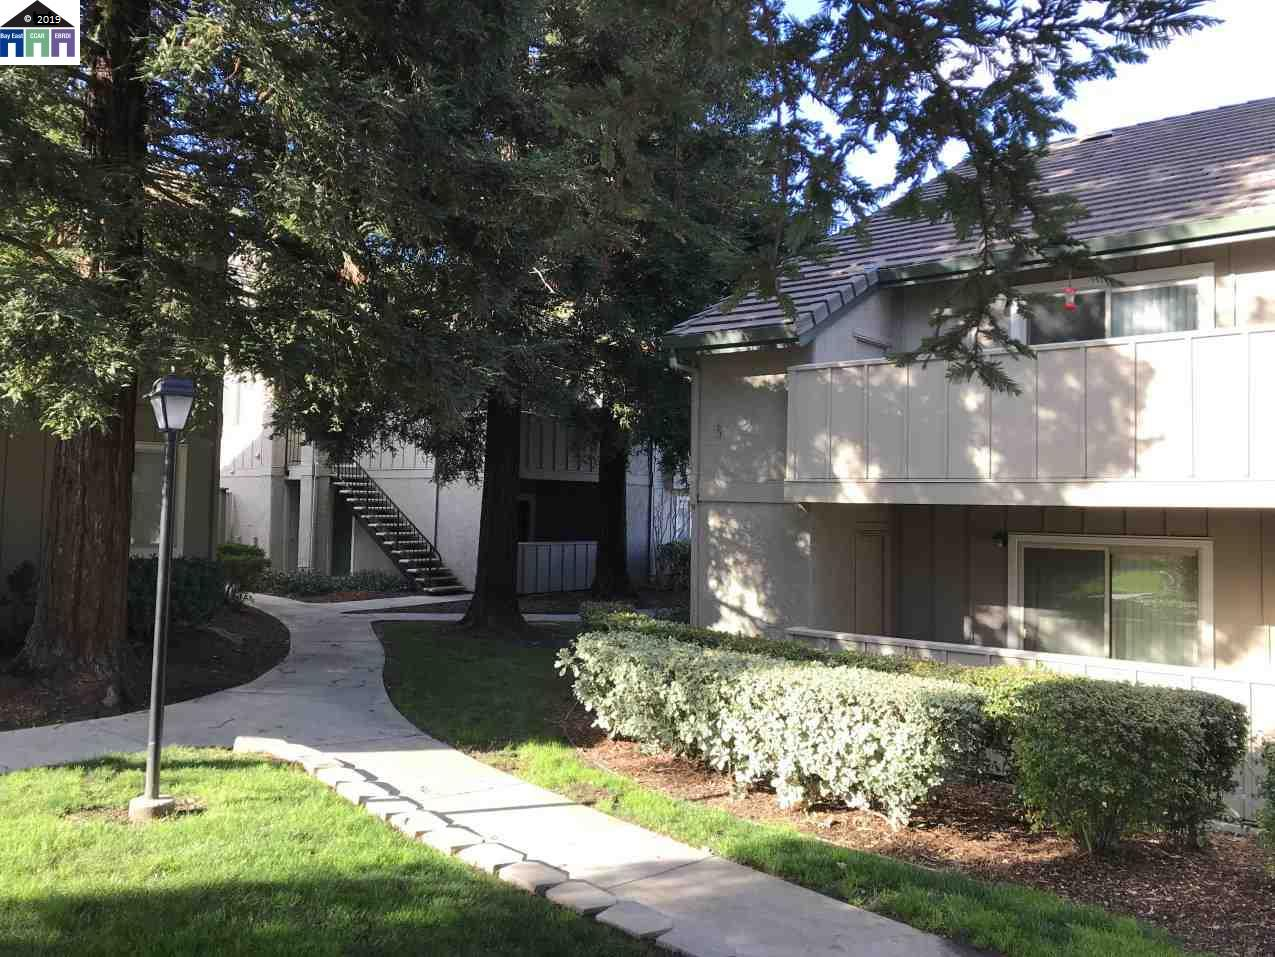 1155 Lakeview Cir, PITTSBURG, CA 94565